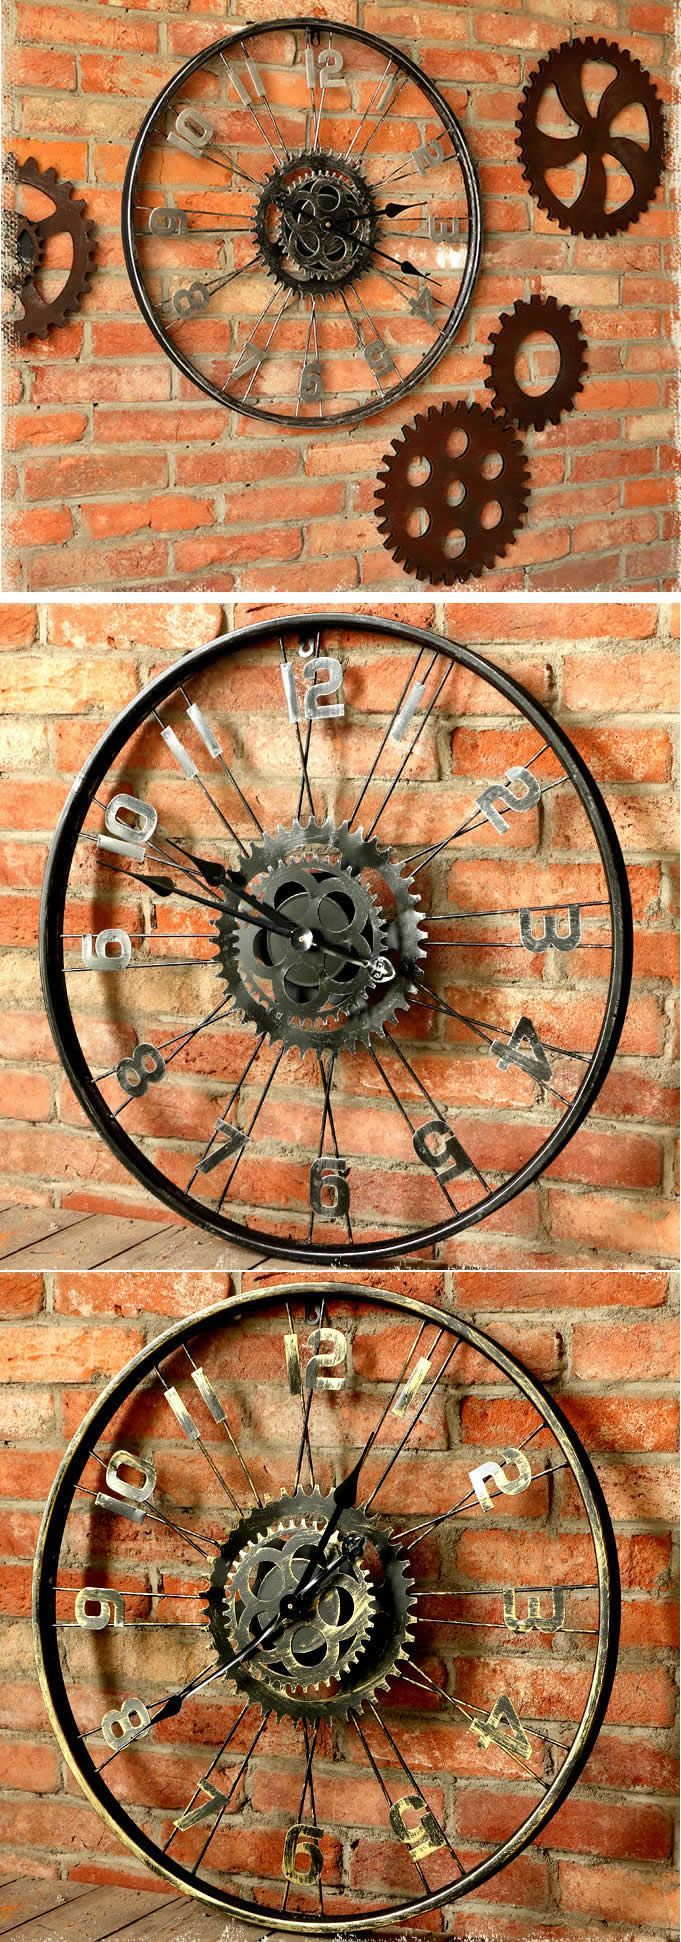 Bicycle Wheel Gear Wall Clock #bicycle #clock #gear #wall